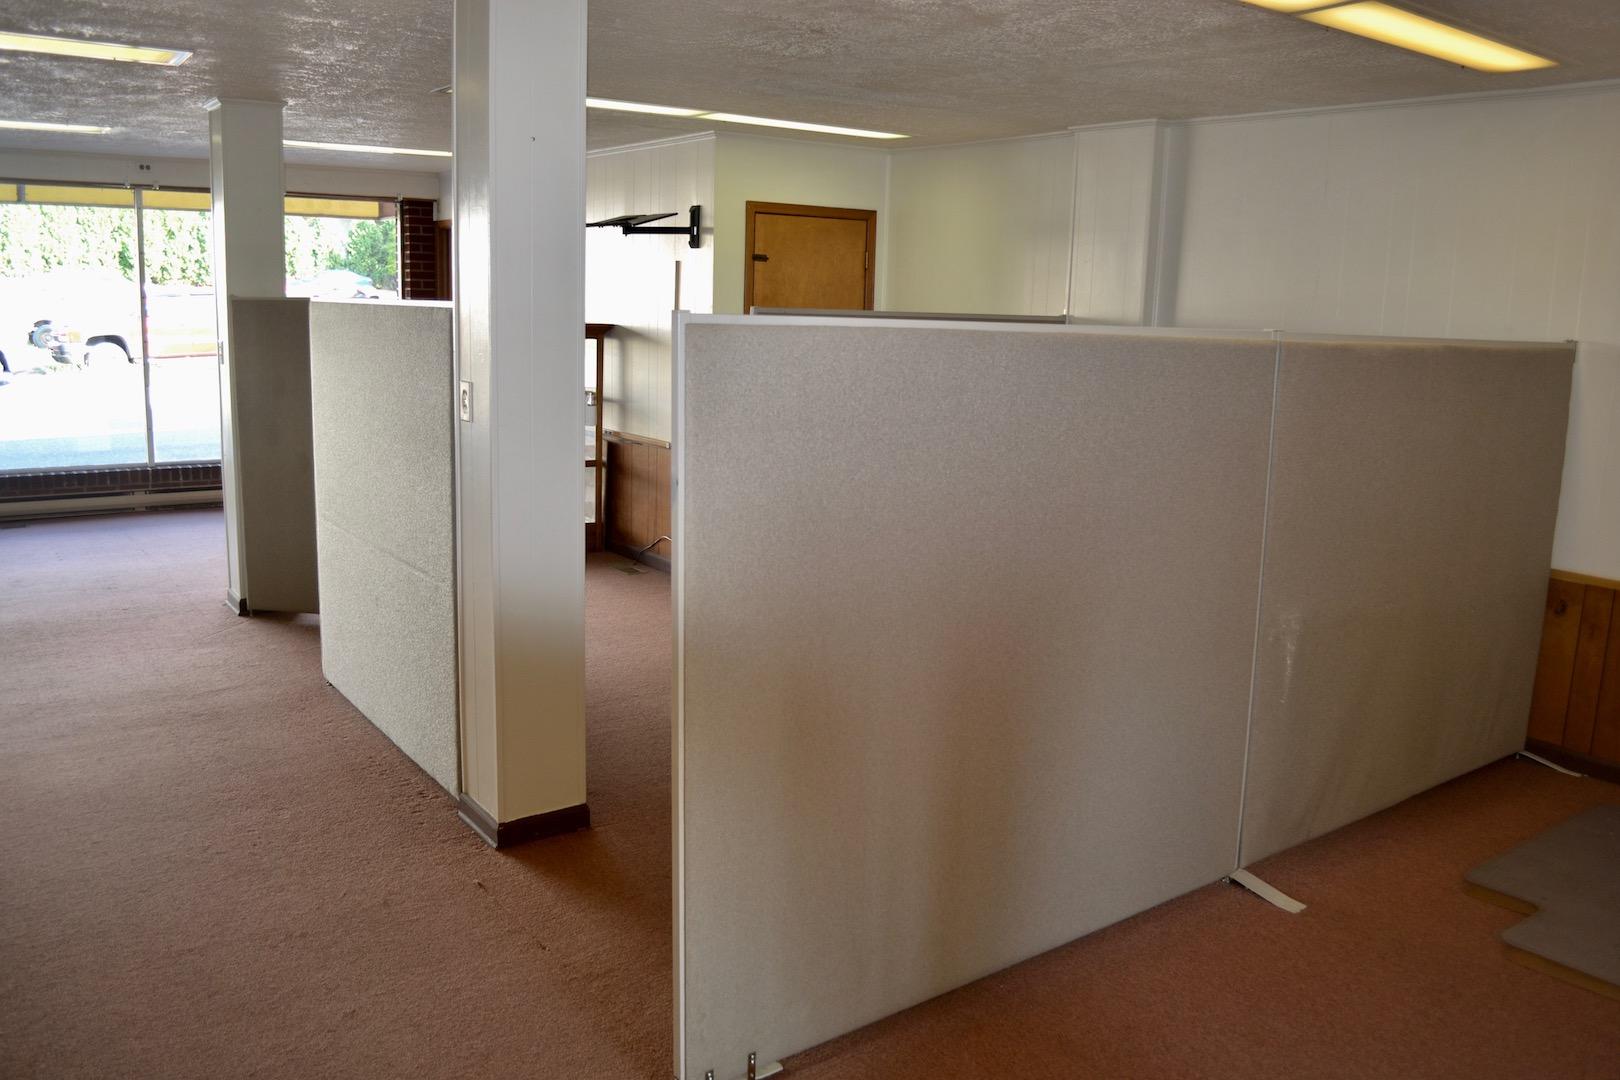 11-First Floor-Main Office Space-5.jpg